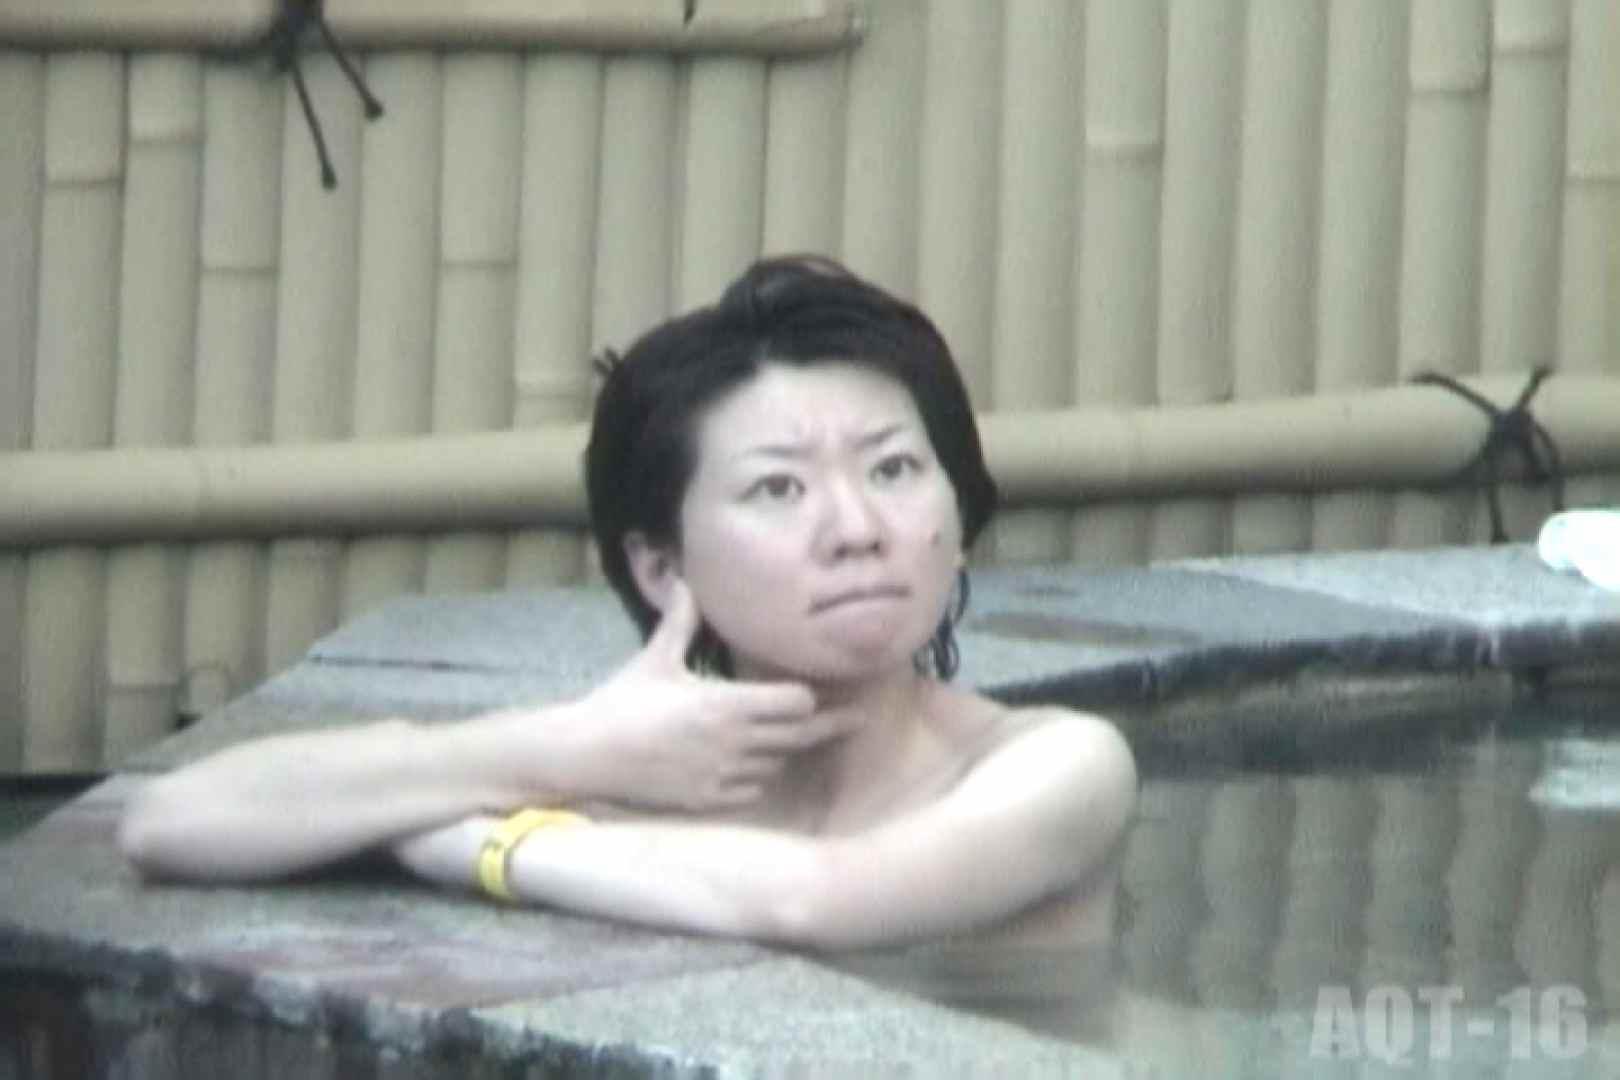 Aquaな露天風呂Vol.842 盗撮師作品  96pic 6